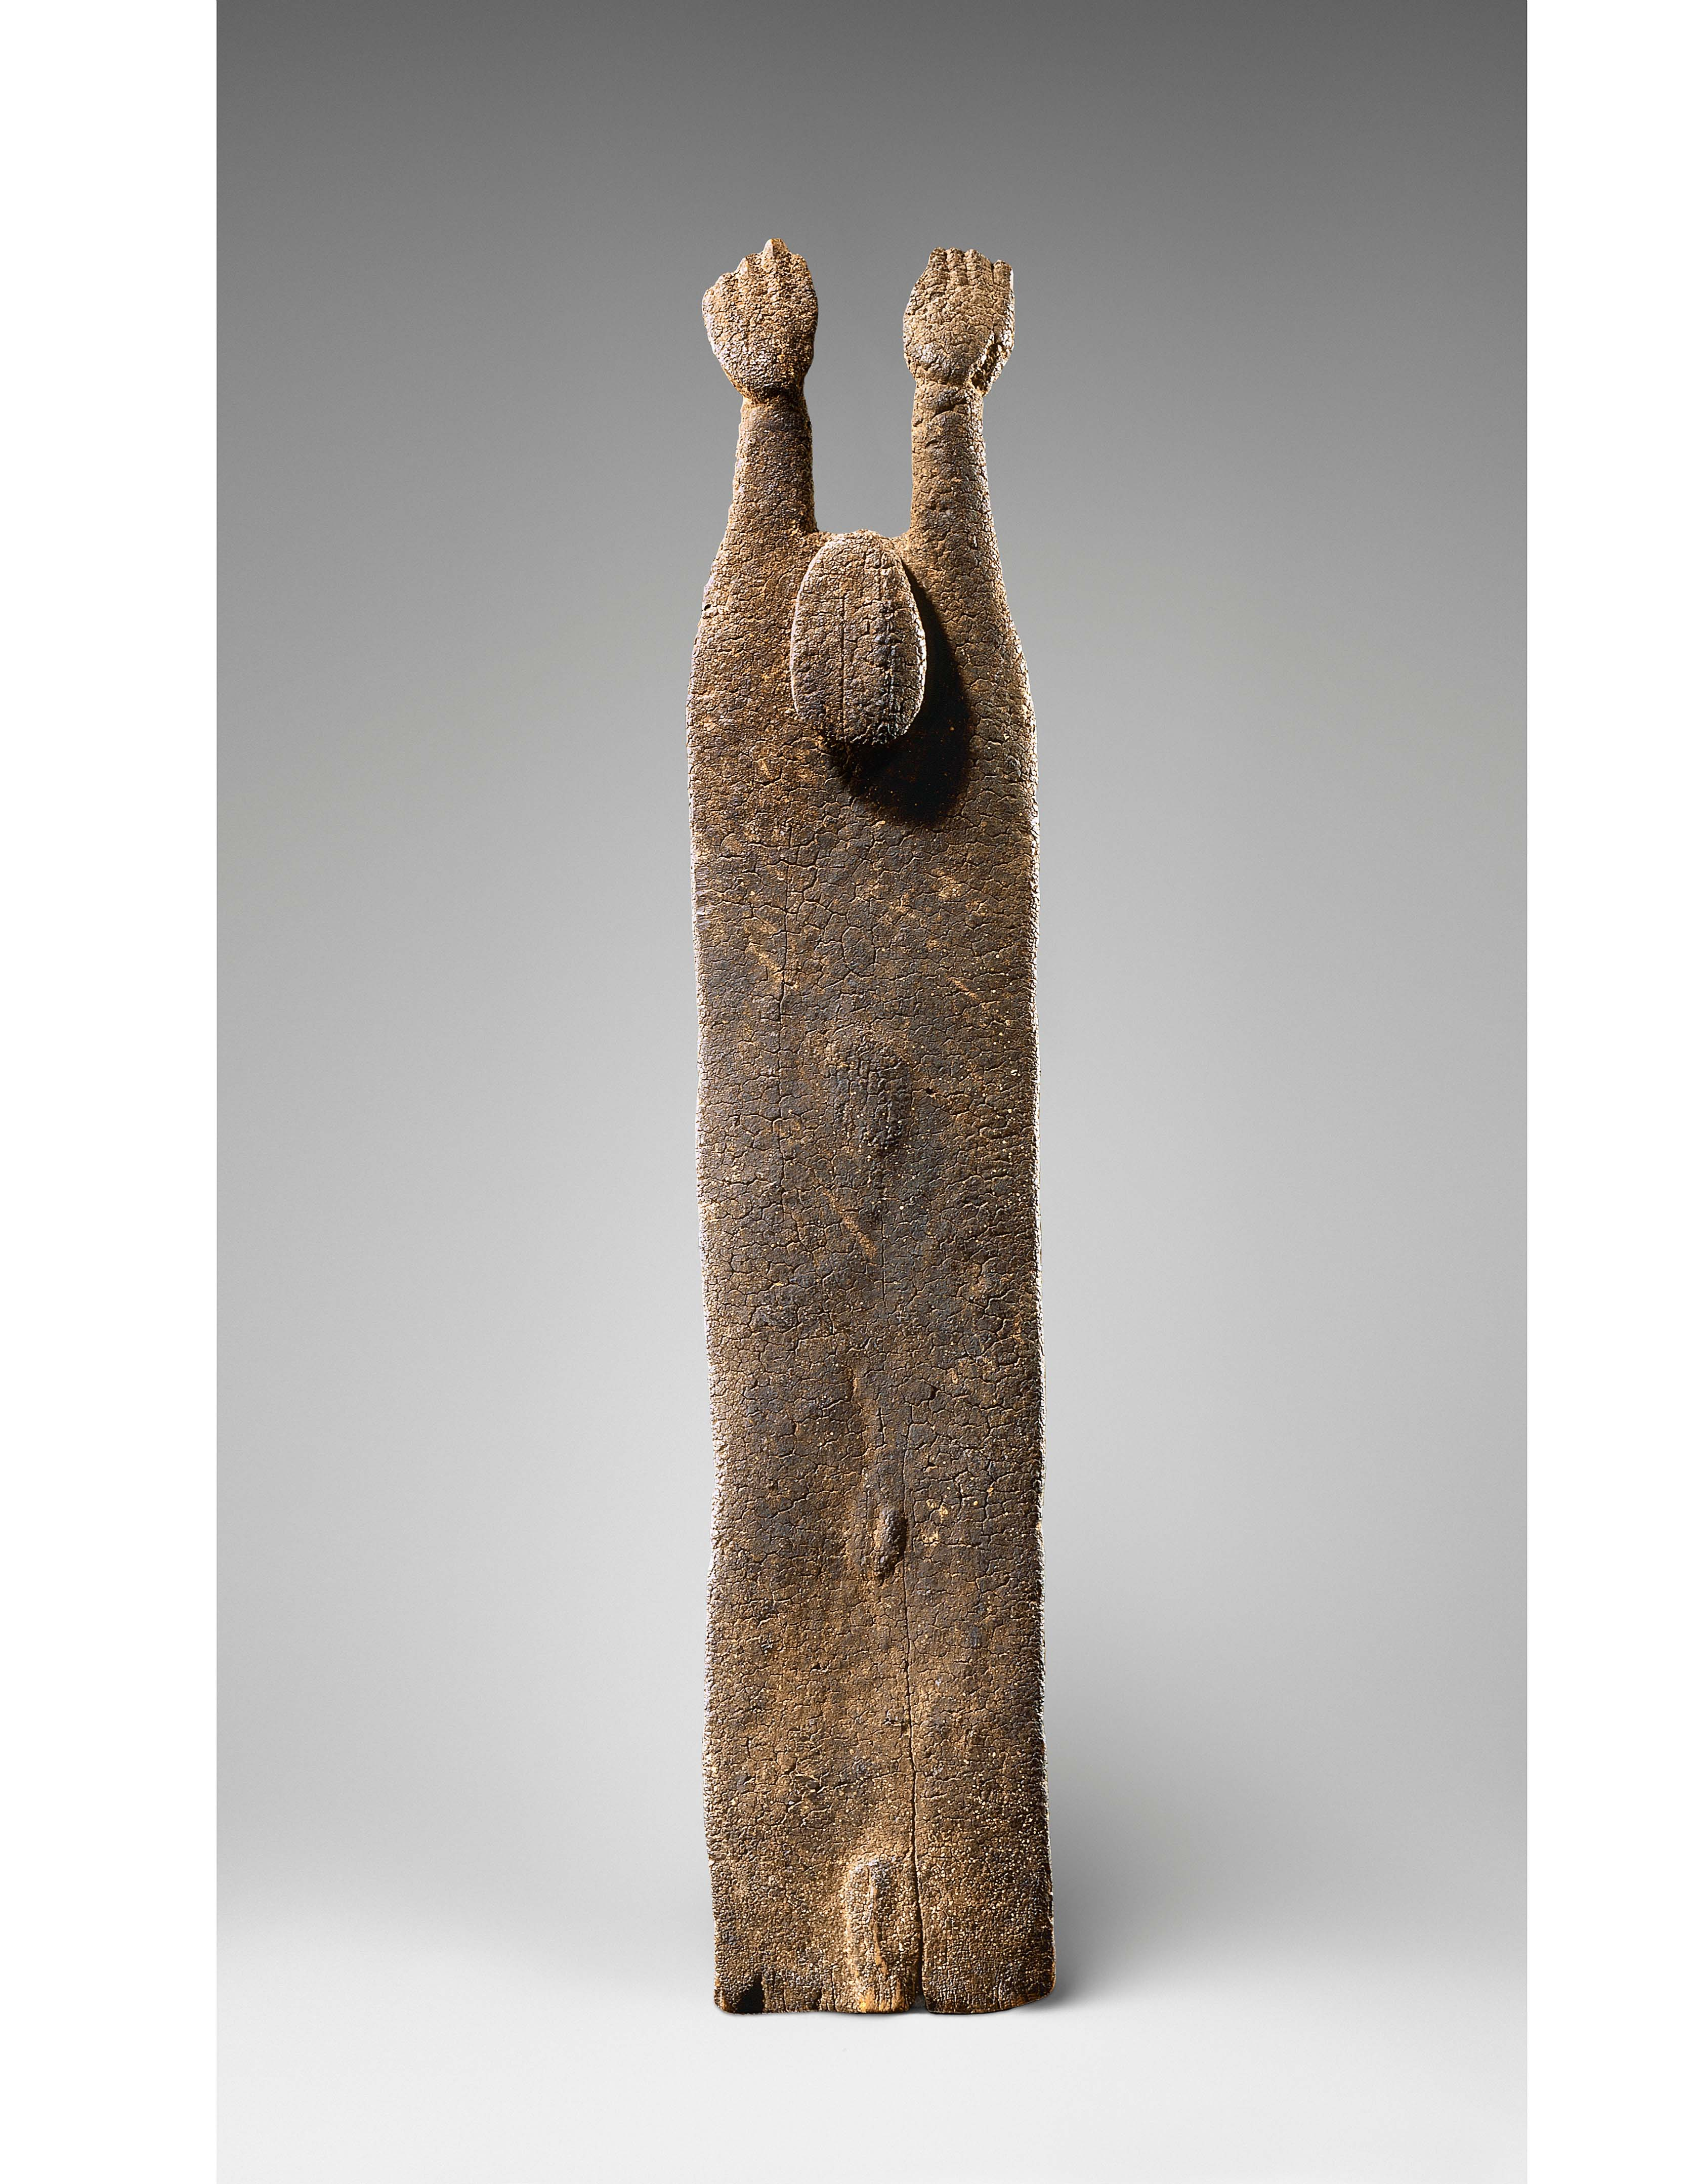 Figure with Raised Arms, Tellem civilization, Ibi, Mali 16th–17th century, Photo credit: © Archives Fondation Dapper—Photo Hughes Dubois